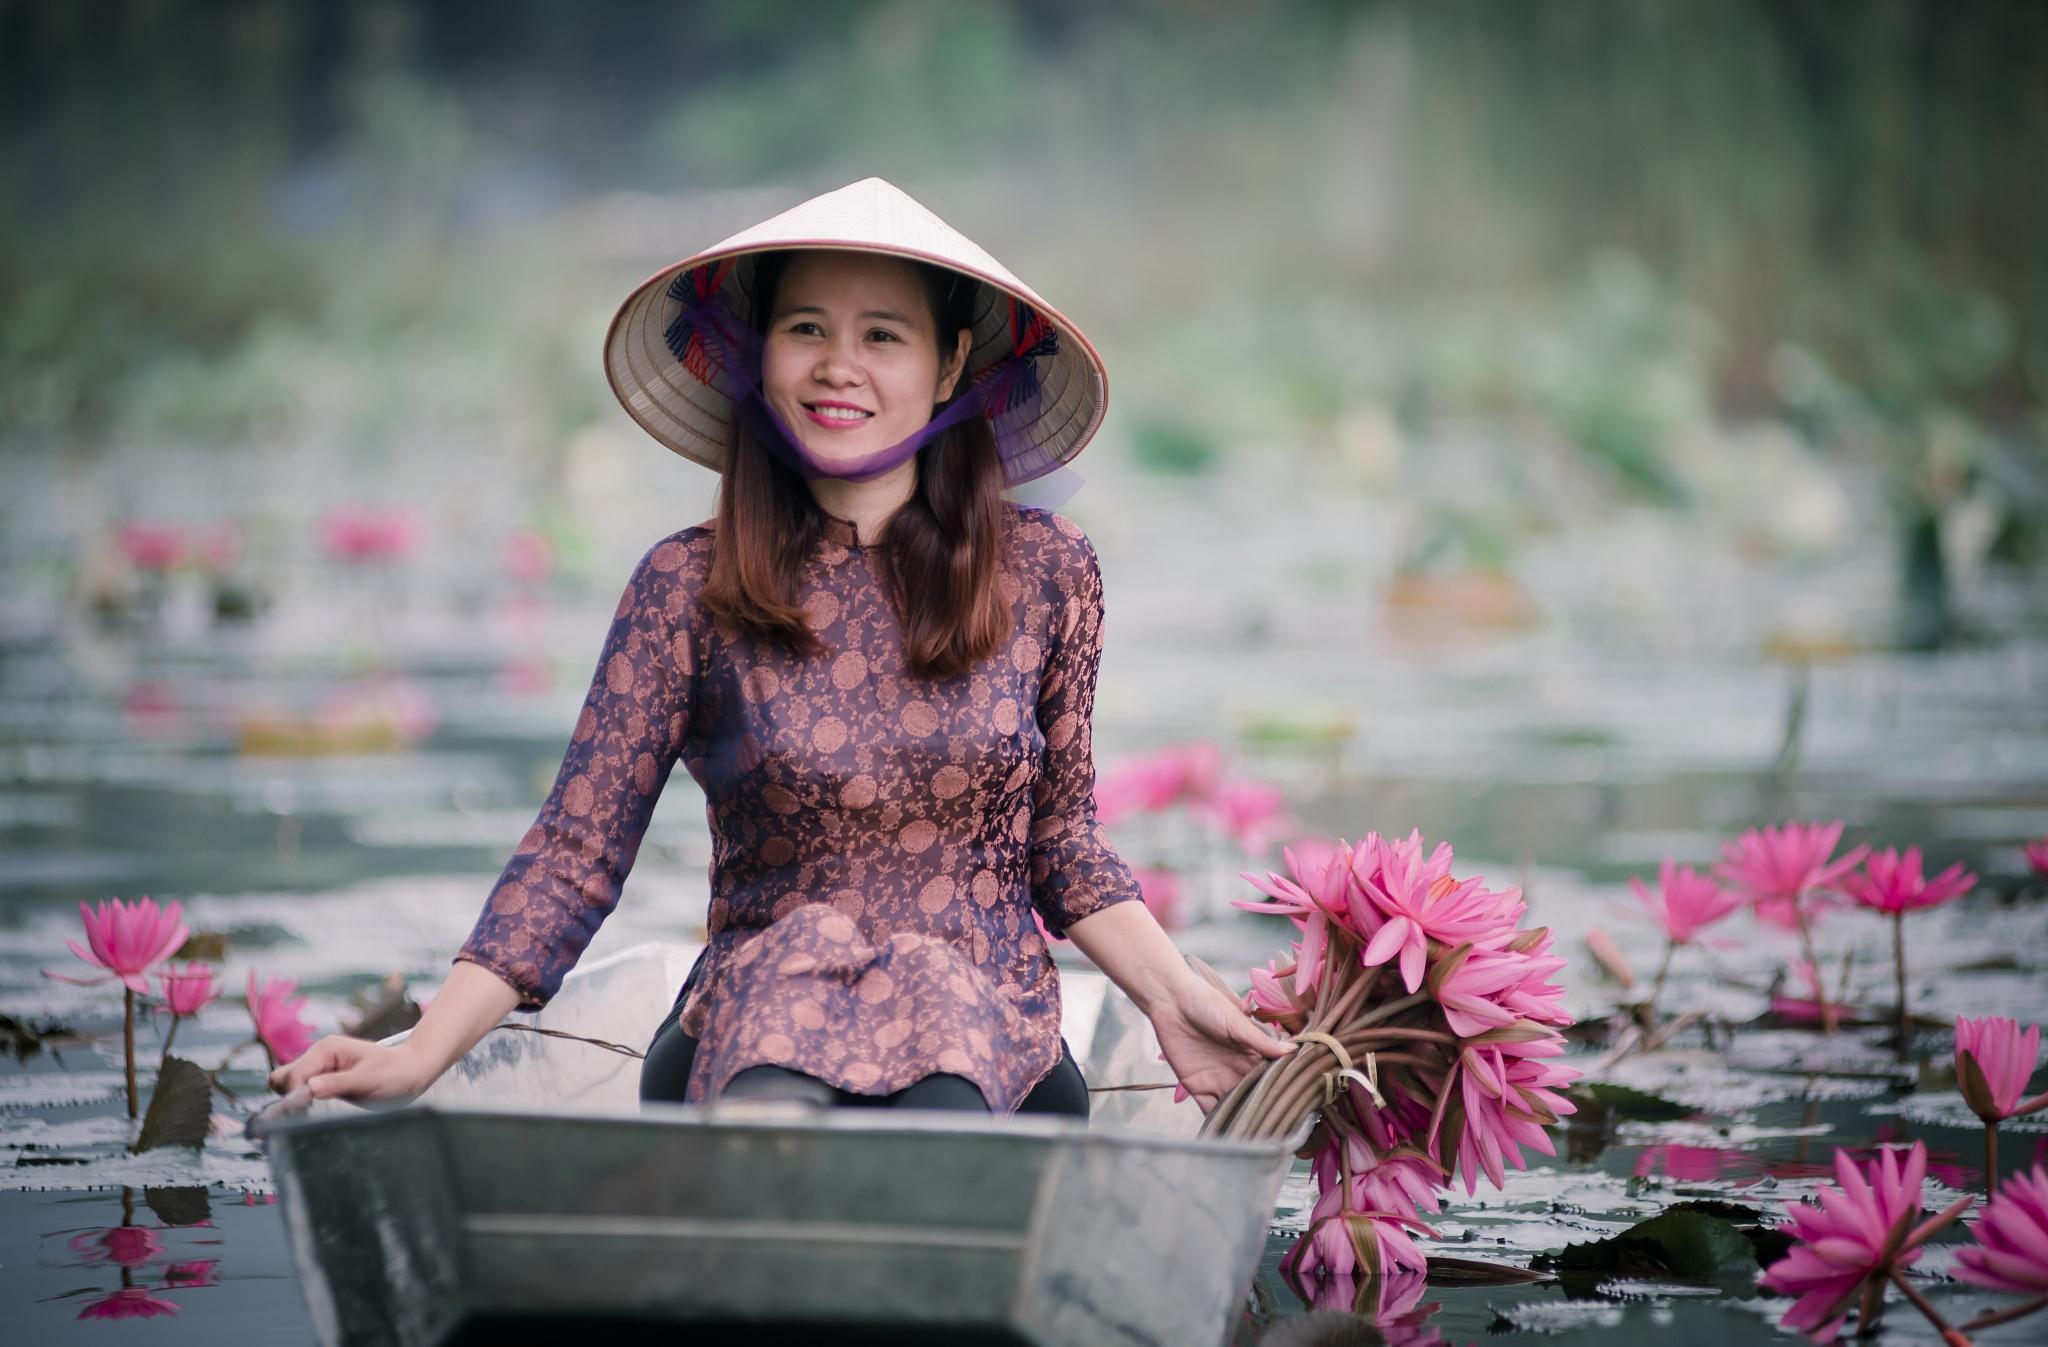 Vietnamese Beauty at Yen River by Quang Le